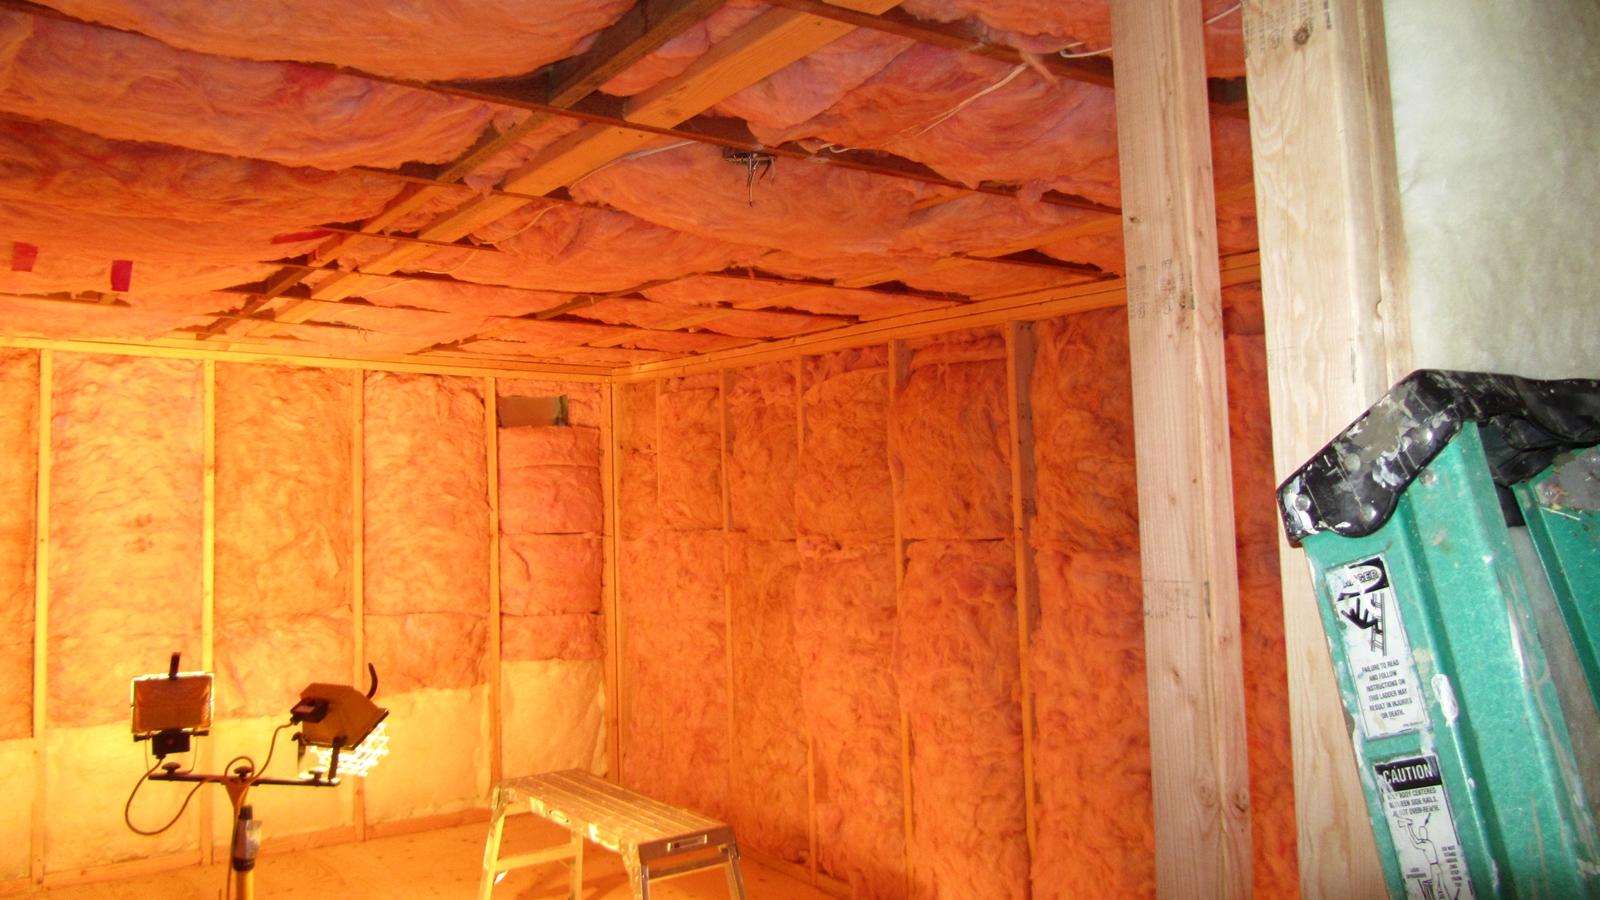 4. Adding insulation